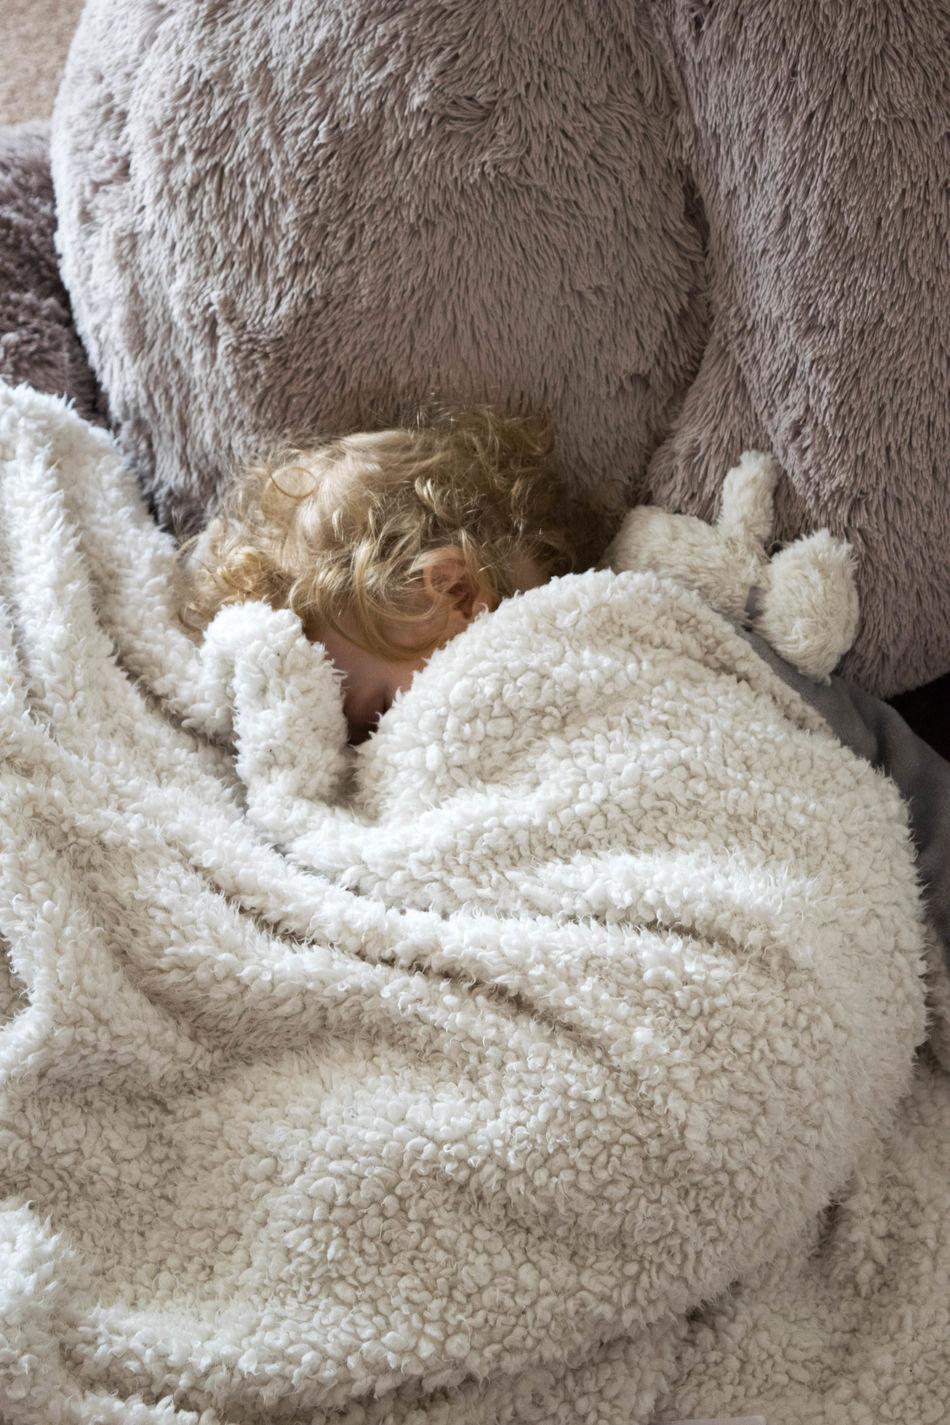 Bear Blanket Child Childhood Comfort Cuddle Curles Cute Day Indoors  Innocence Little Nap Naptime Precious Rest Sleep Small Snuggle Stuffed Bear Stuffed Toy Teddybear Tiny Toddler  Youth